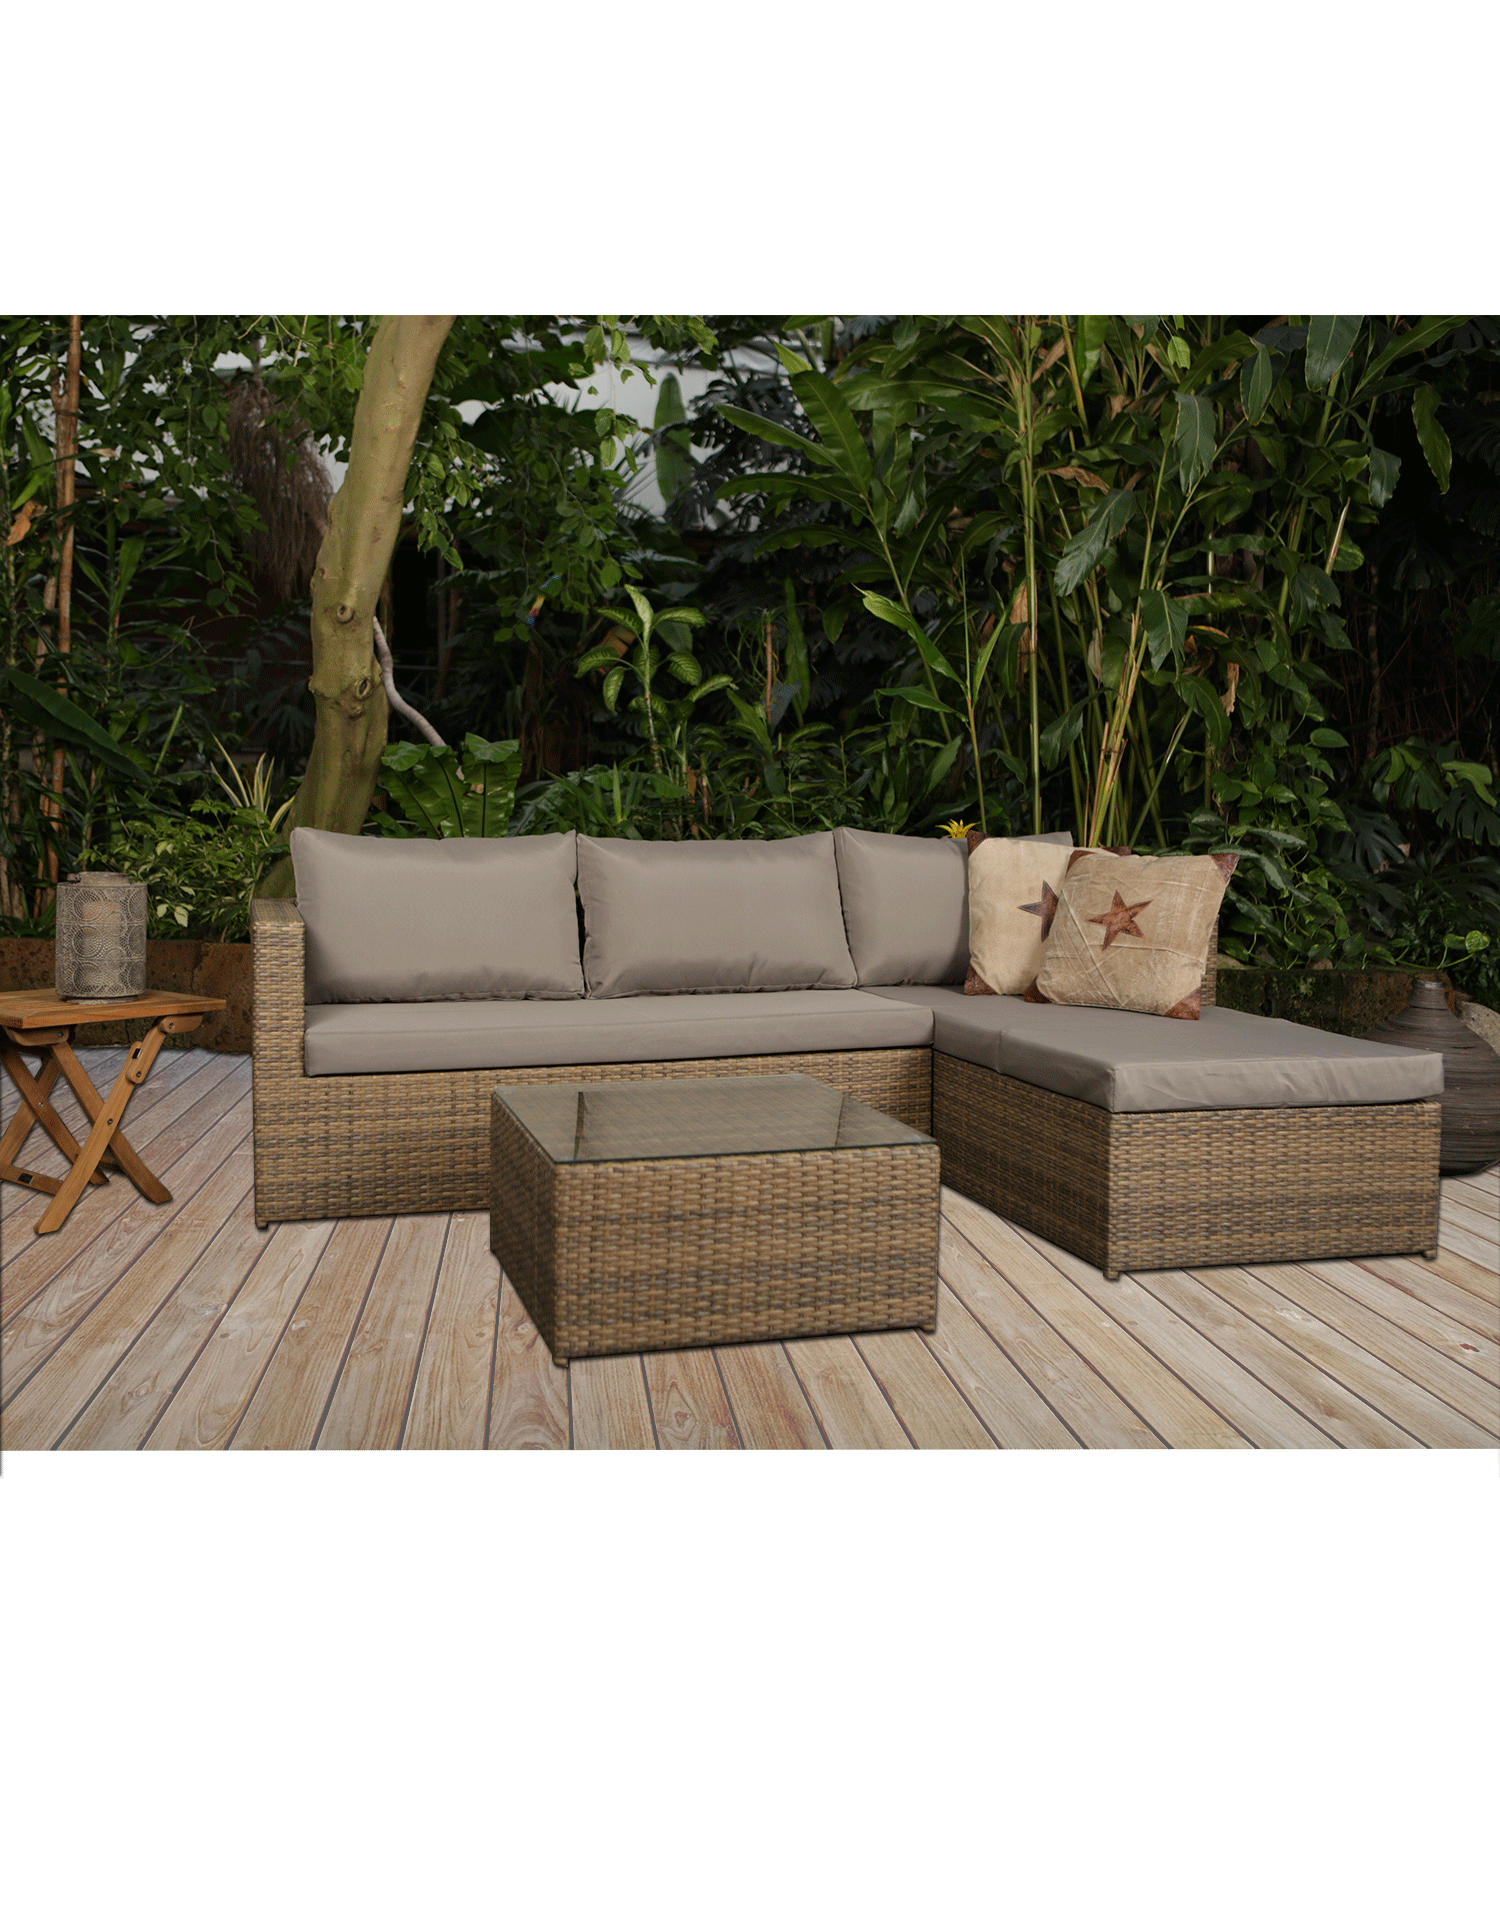 Rattan Lounge Gartenmöbel bei Teakland.ch